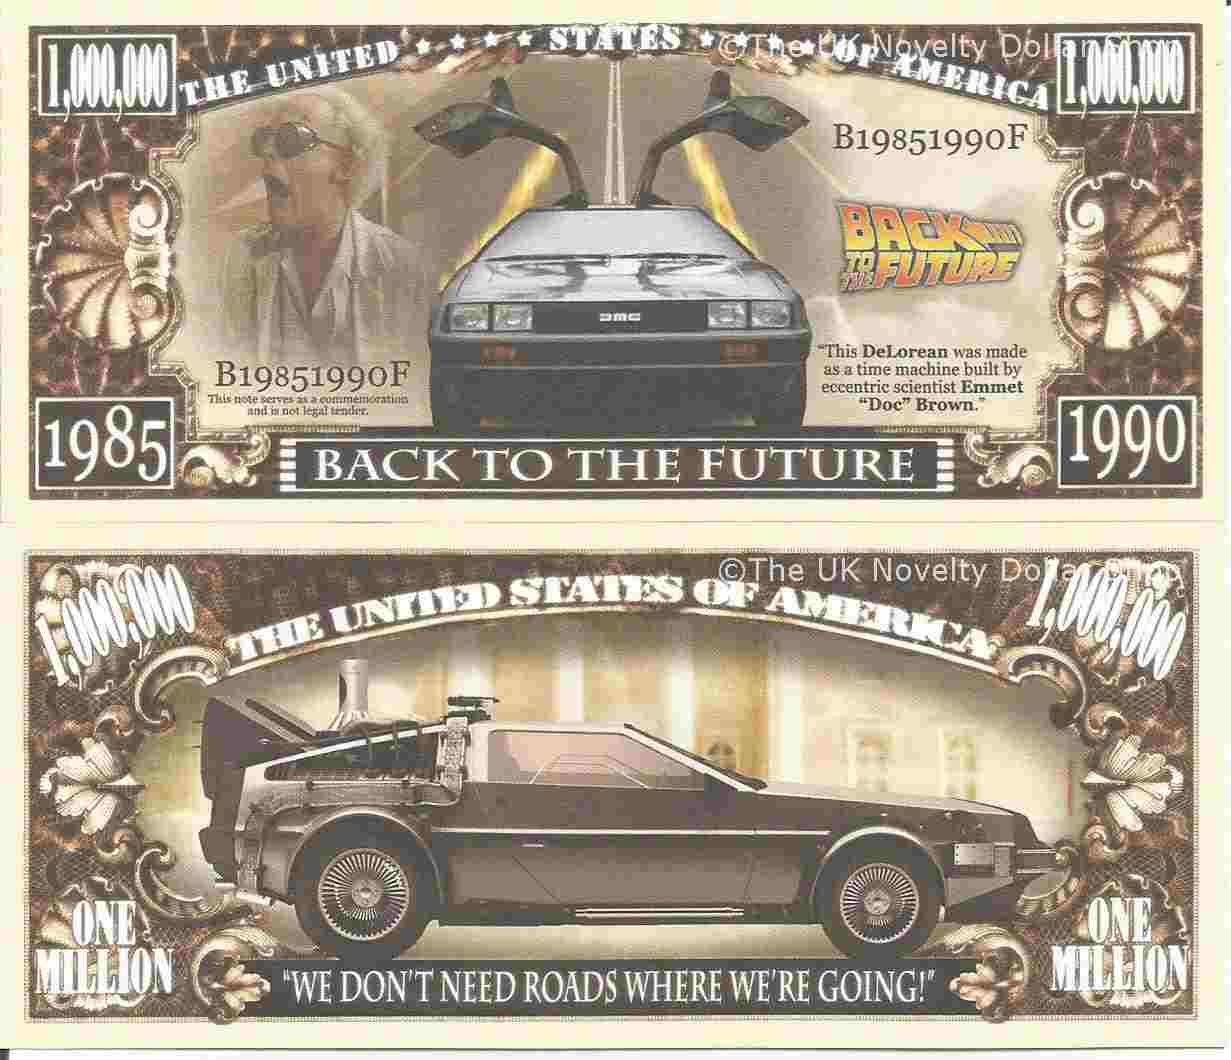 Novelty Dollar Back To The Future DeLorean Sports Car Time Machine Million Dollar Bills x 2